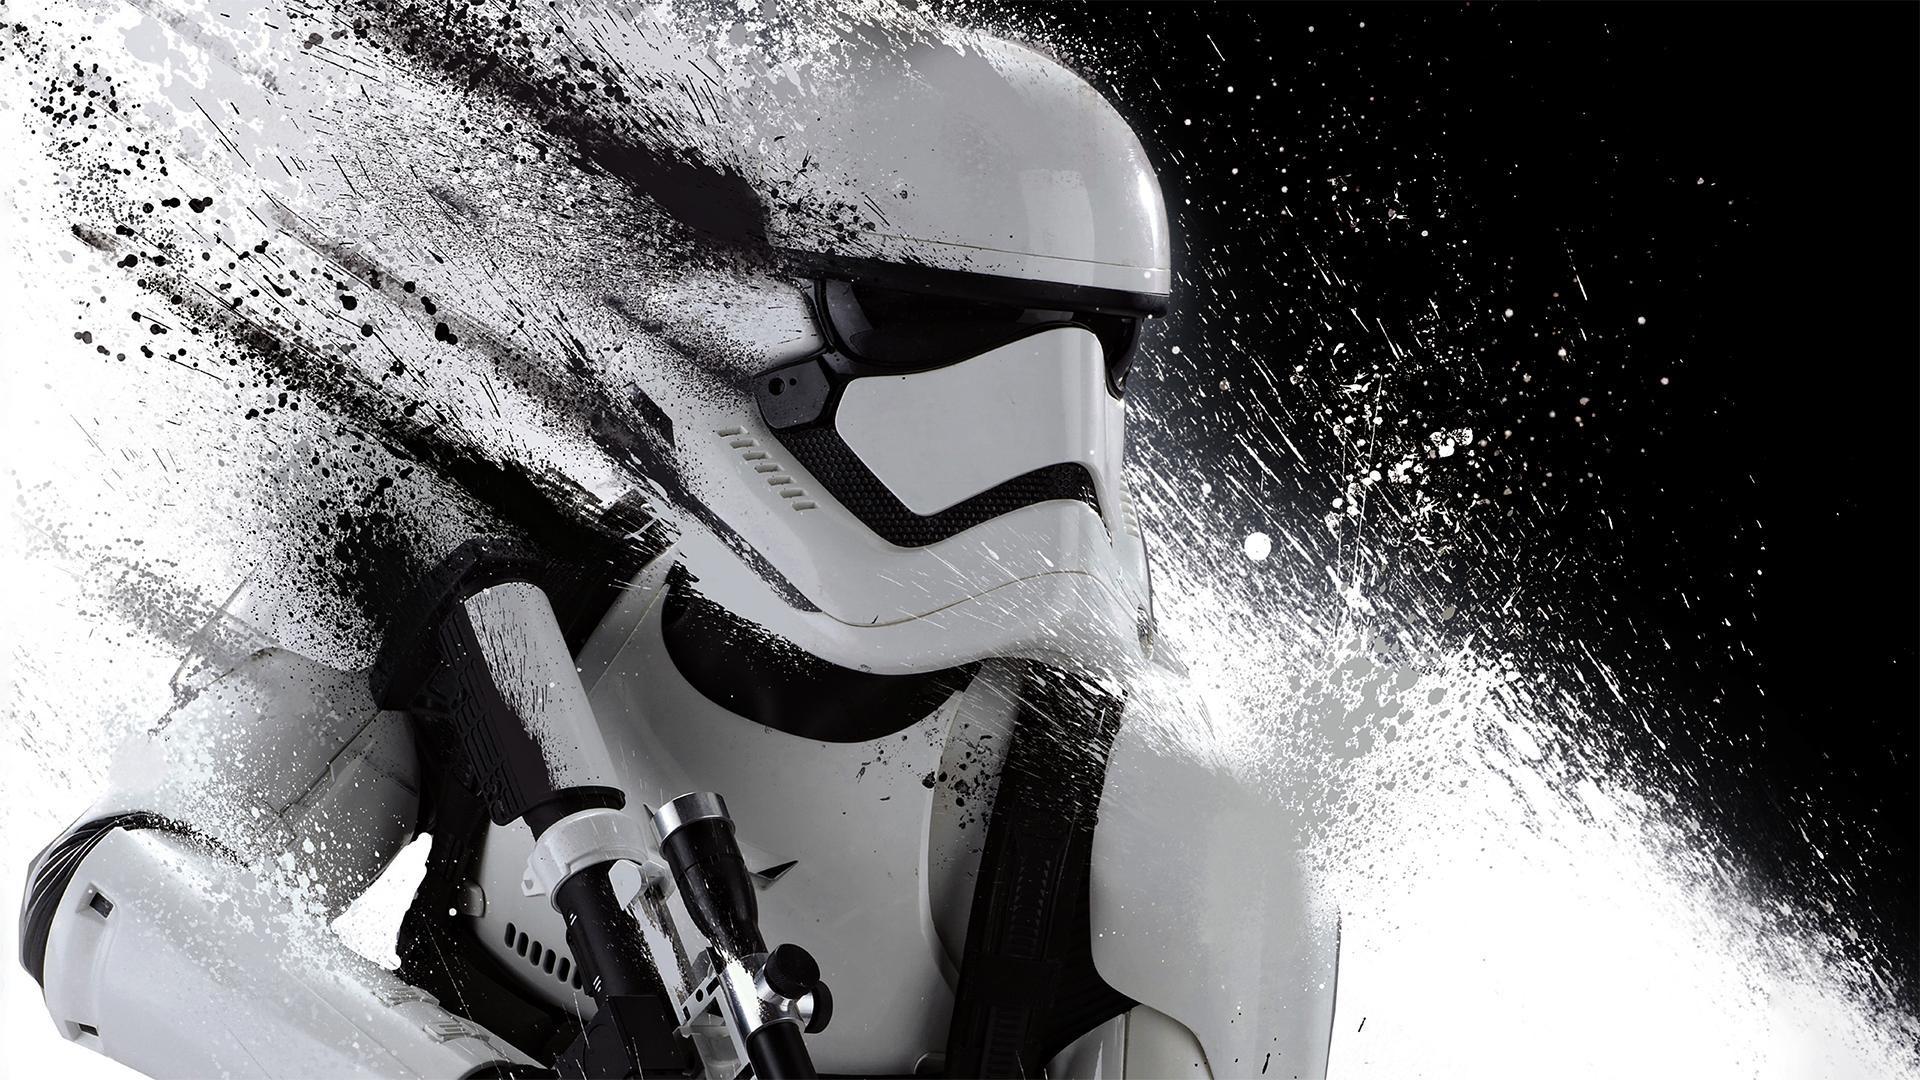 People Star Wars stormtrooper First Order First Order Trooper